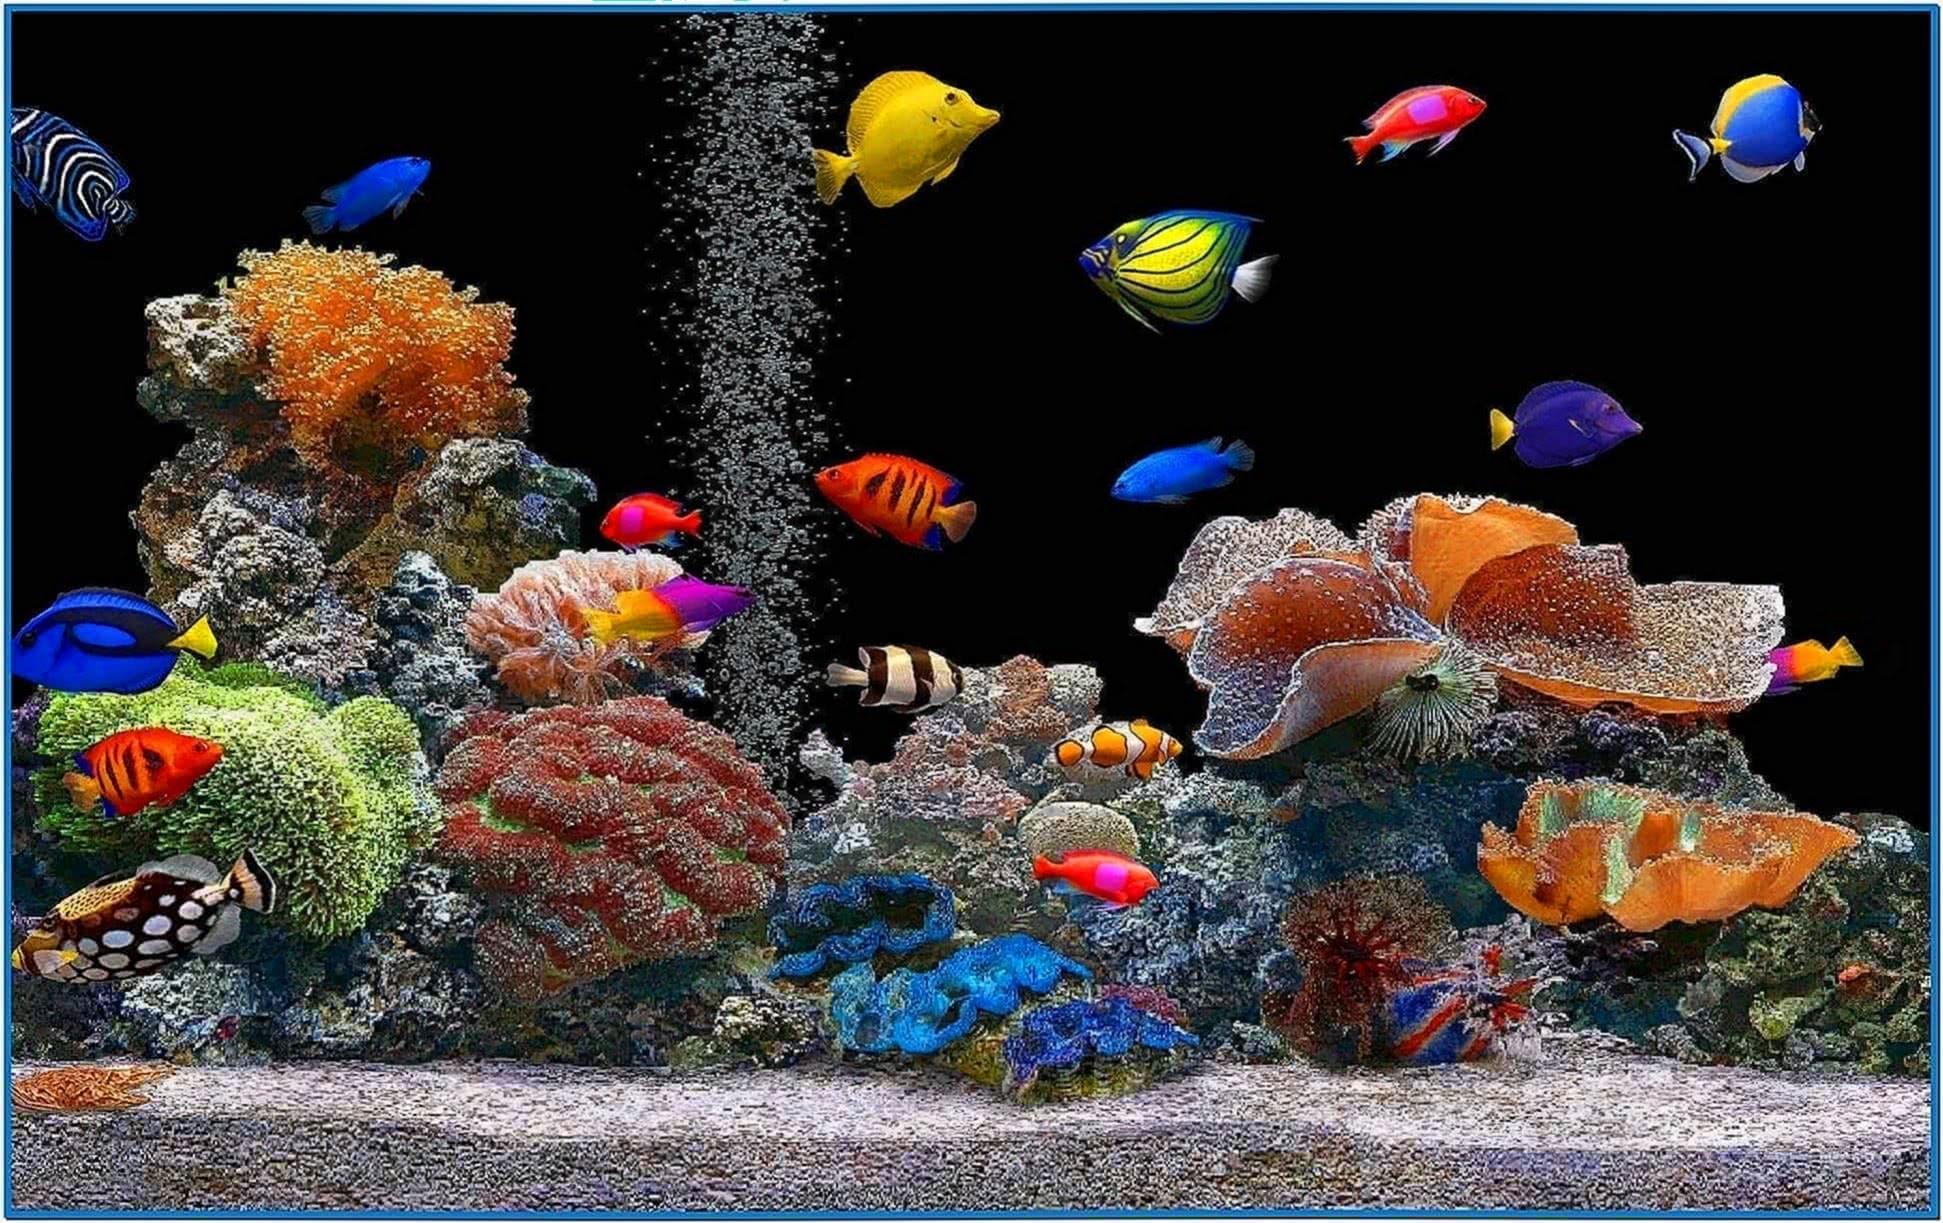 HDTV Screensaver Aquarium